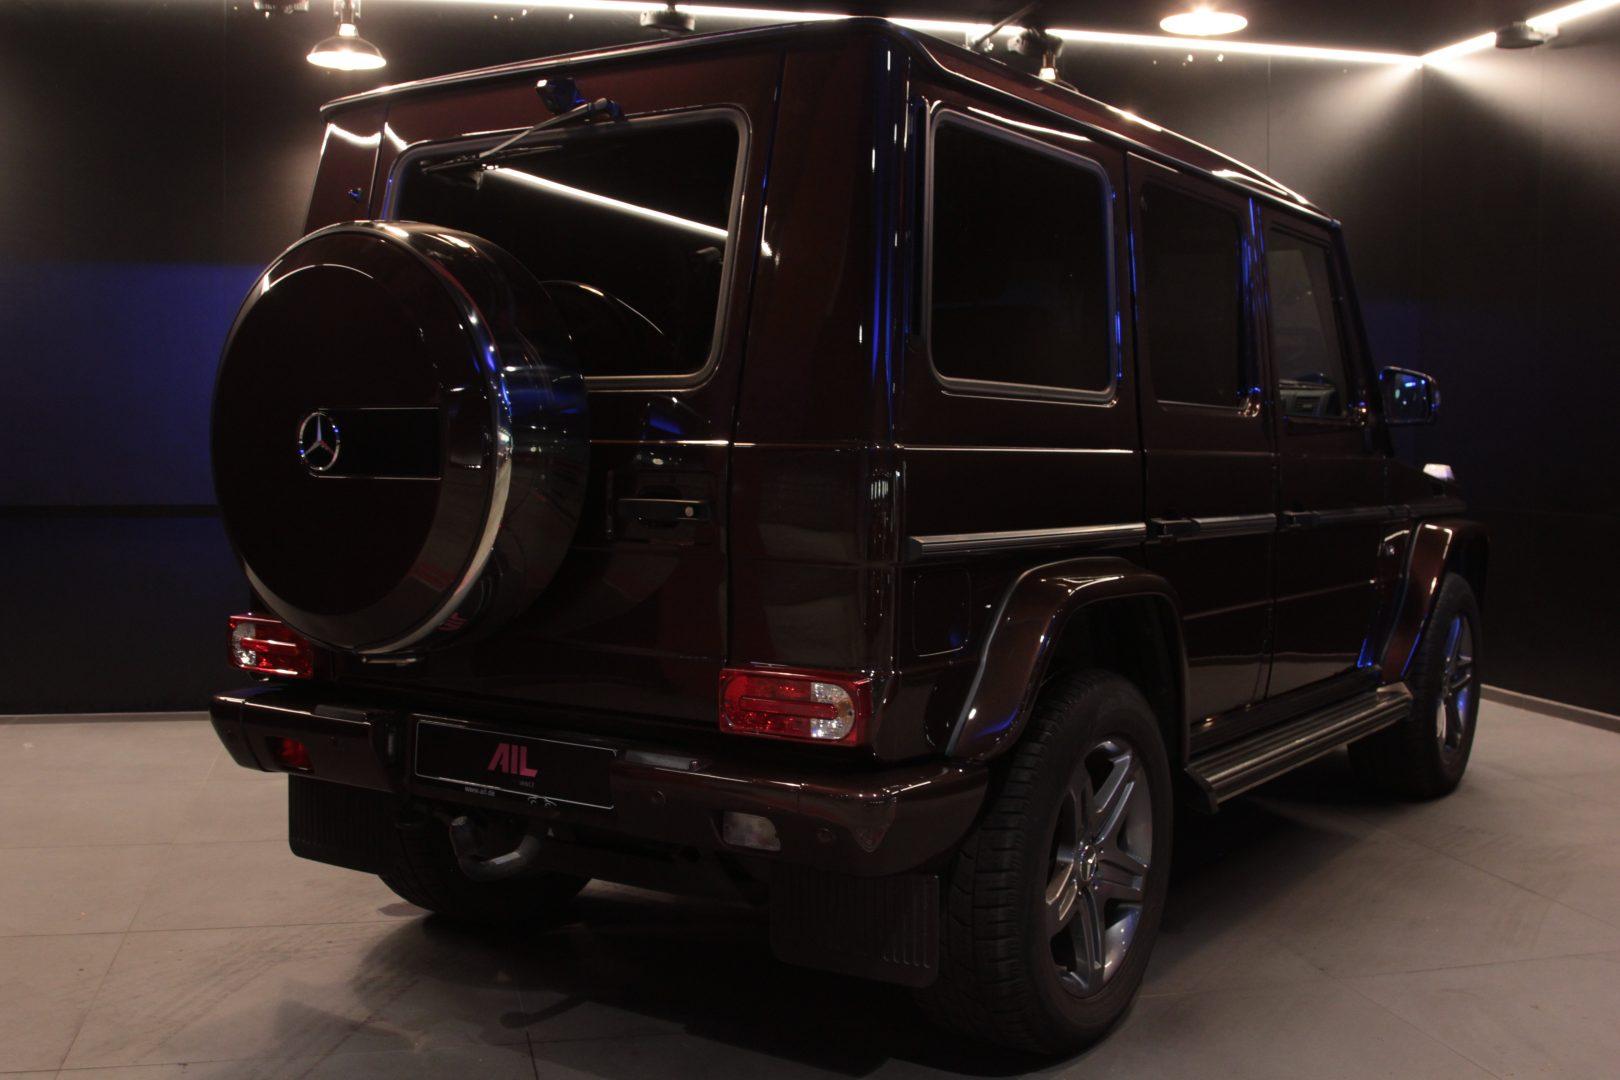 AIL Mercedes-Benz G 500 Exklusiv-Paket 8